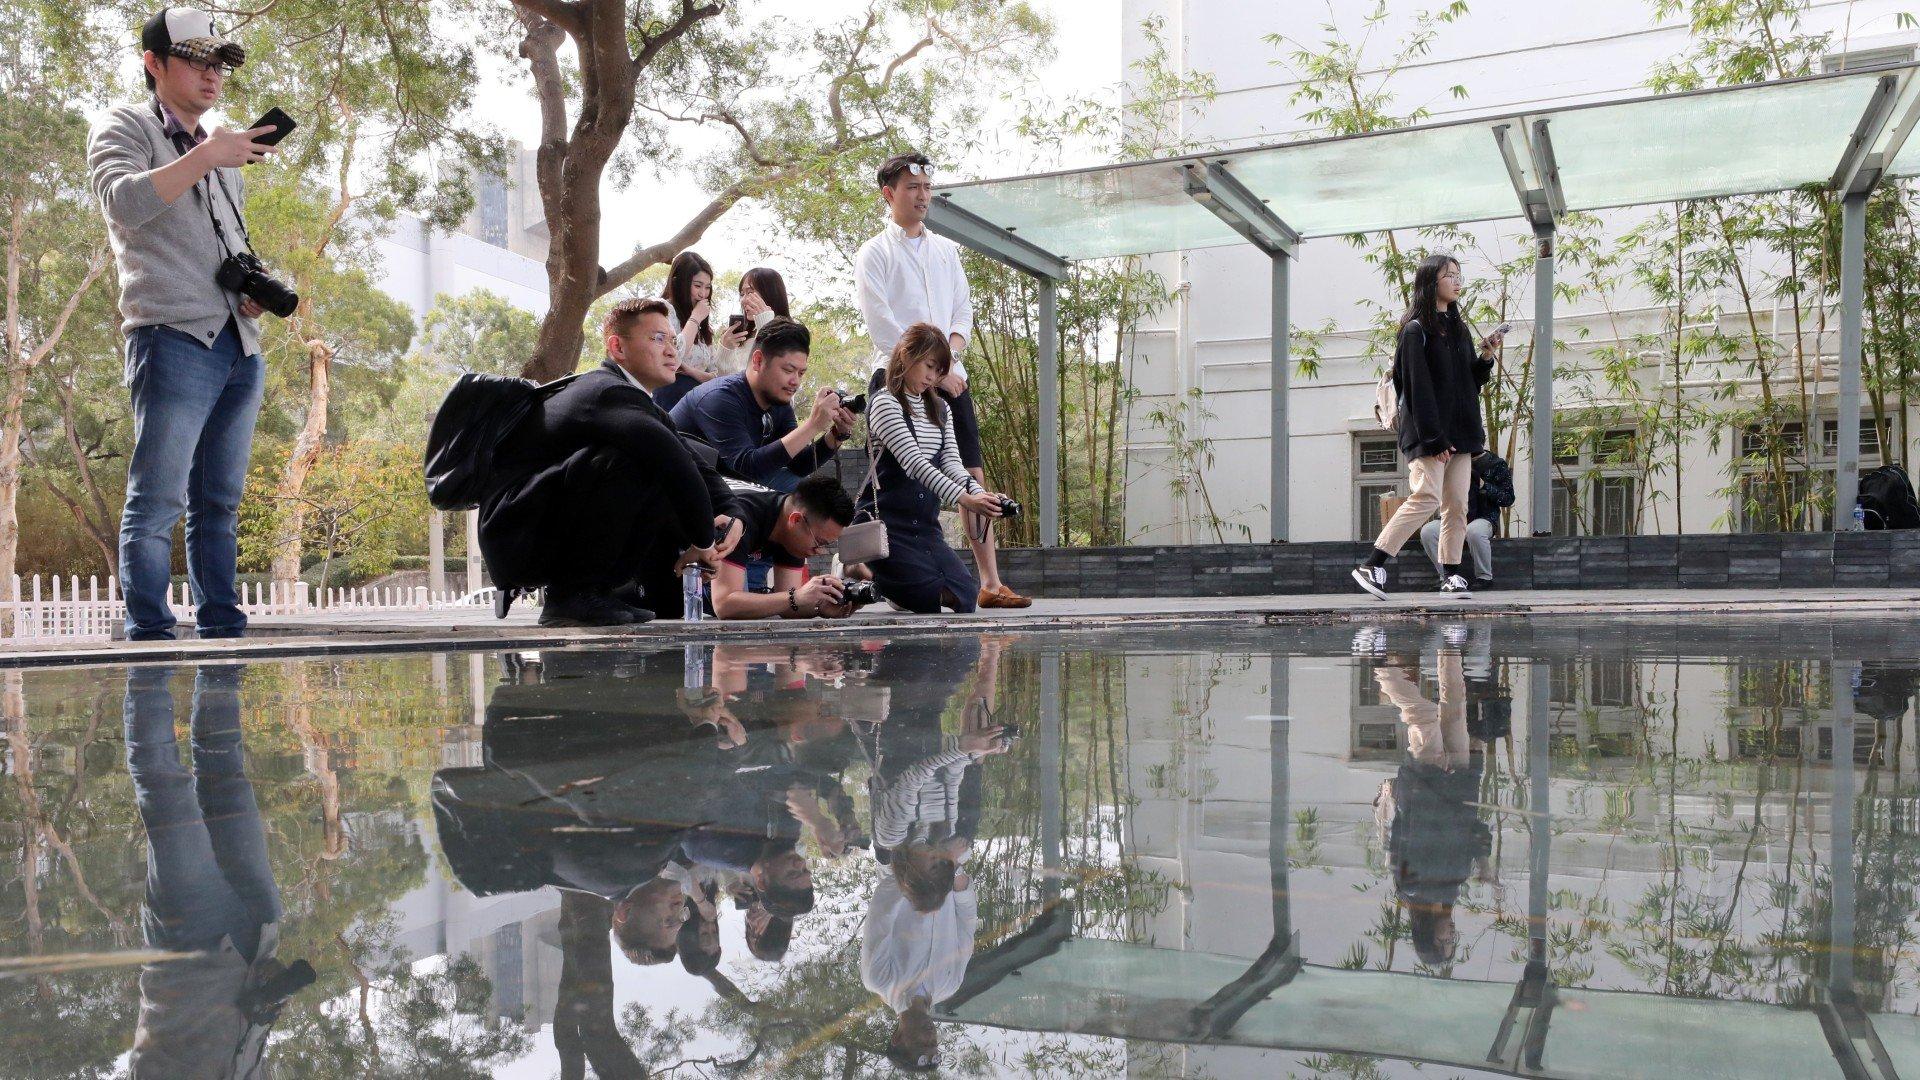 Harmony lacking at scenic university pavilion as mainland